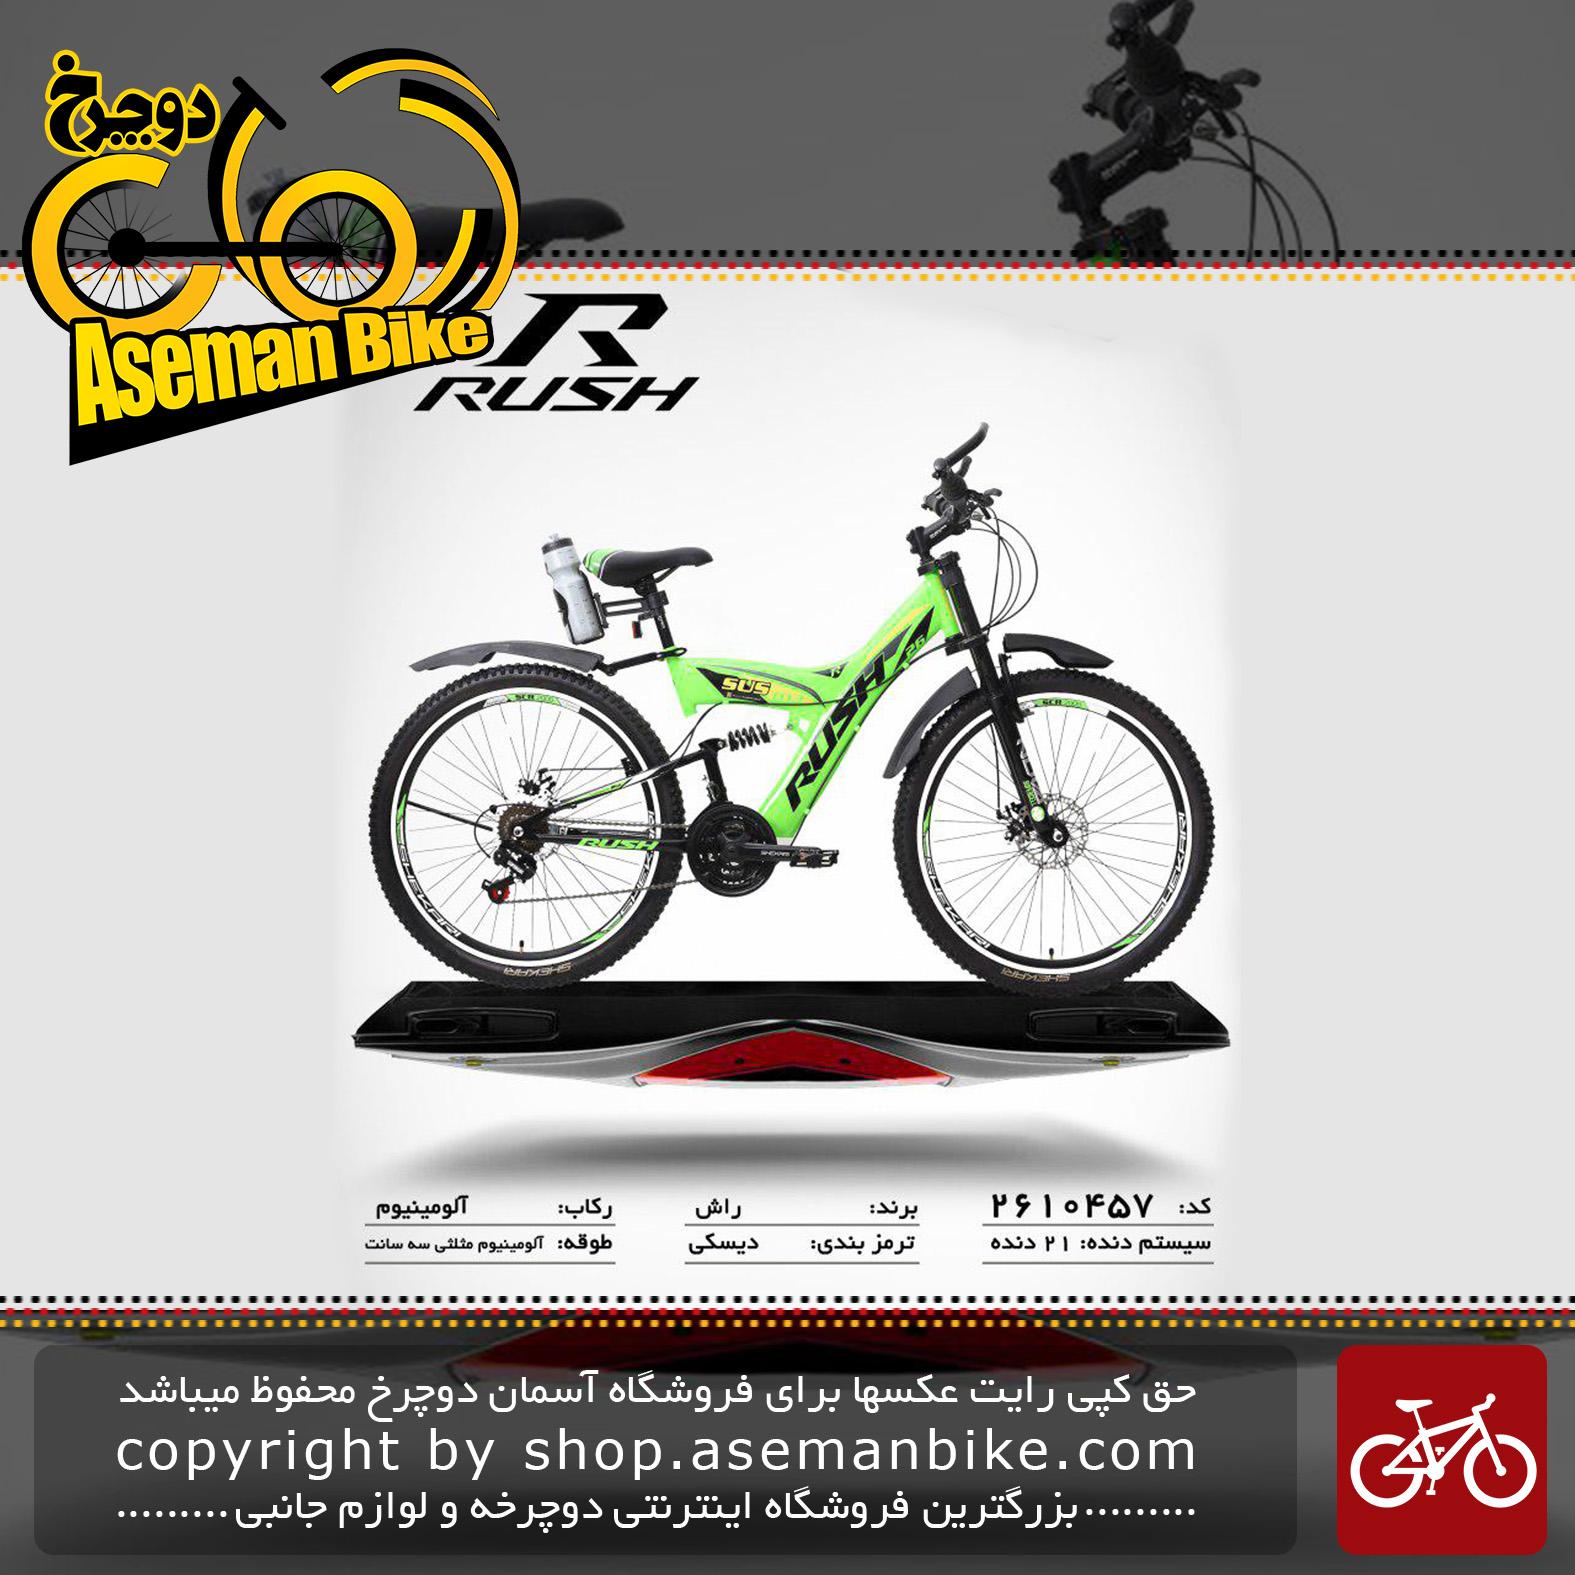 دوچرخه راش سایز 26 21 دنده دو کمک دیسکی مدل57 rush bicycle 26 21 speed dual shock disc 57 2019